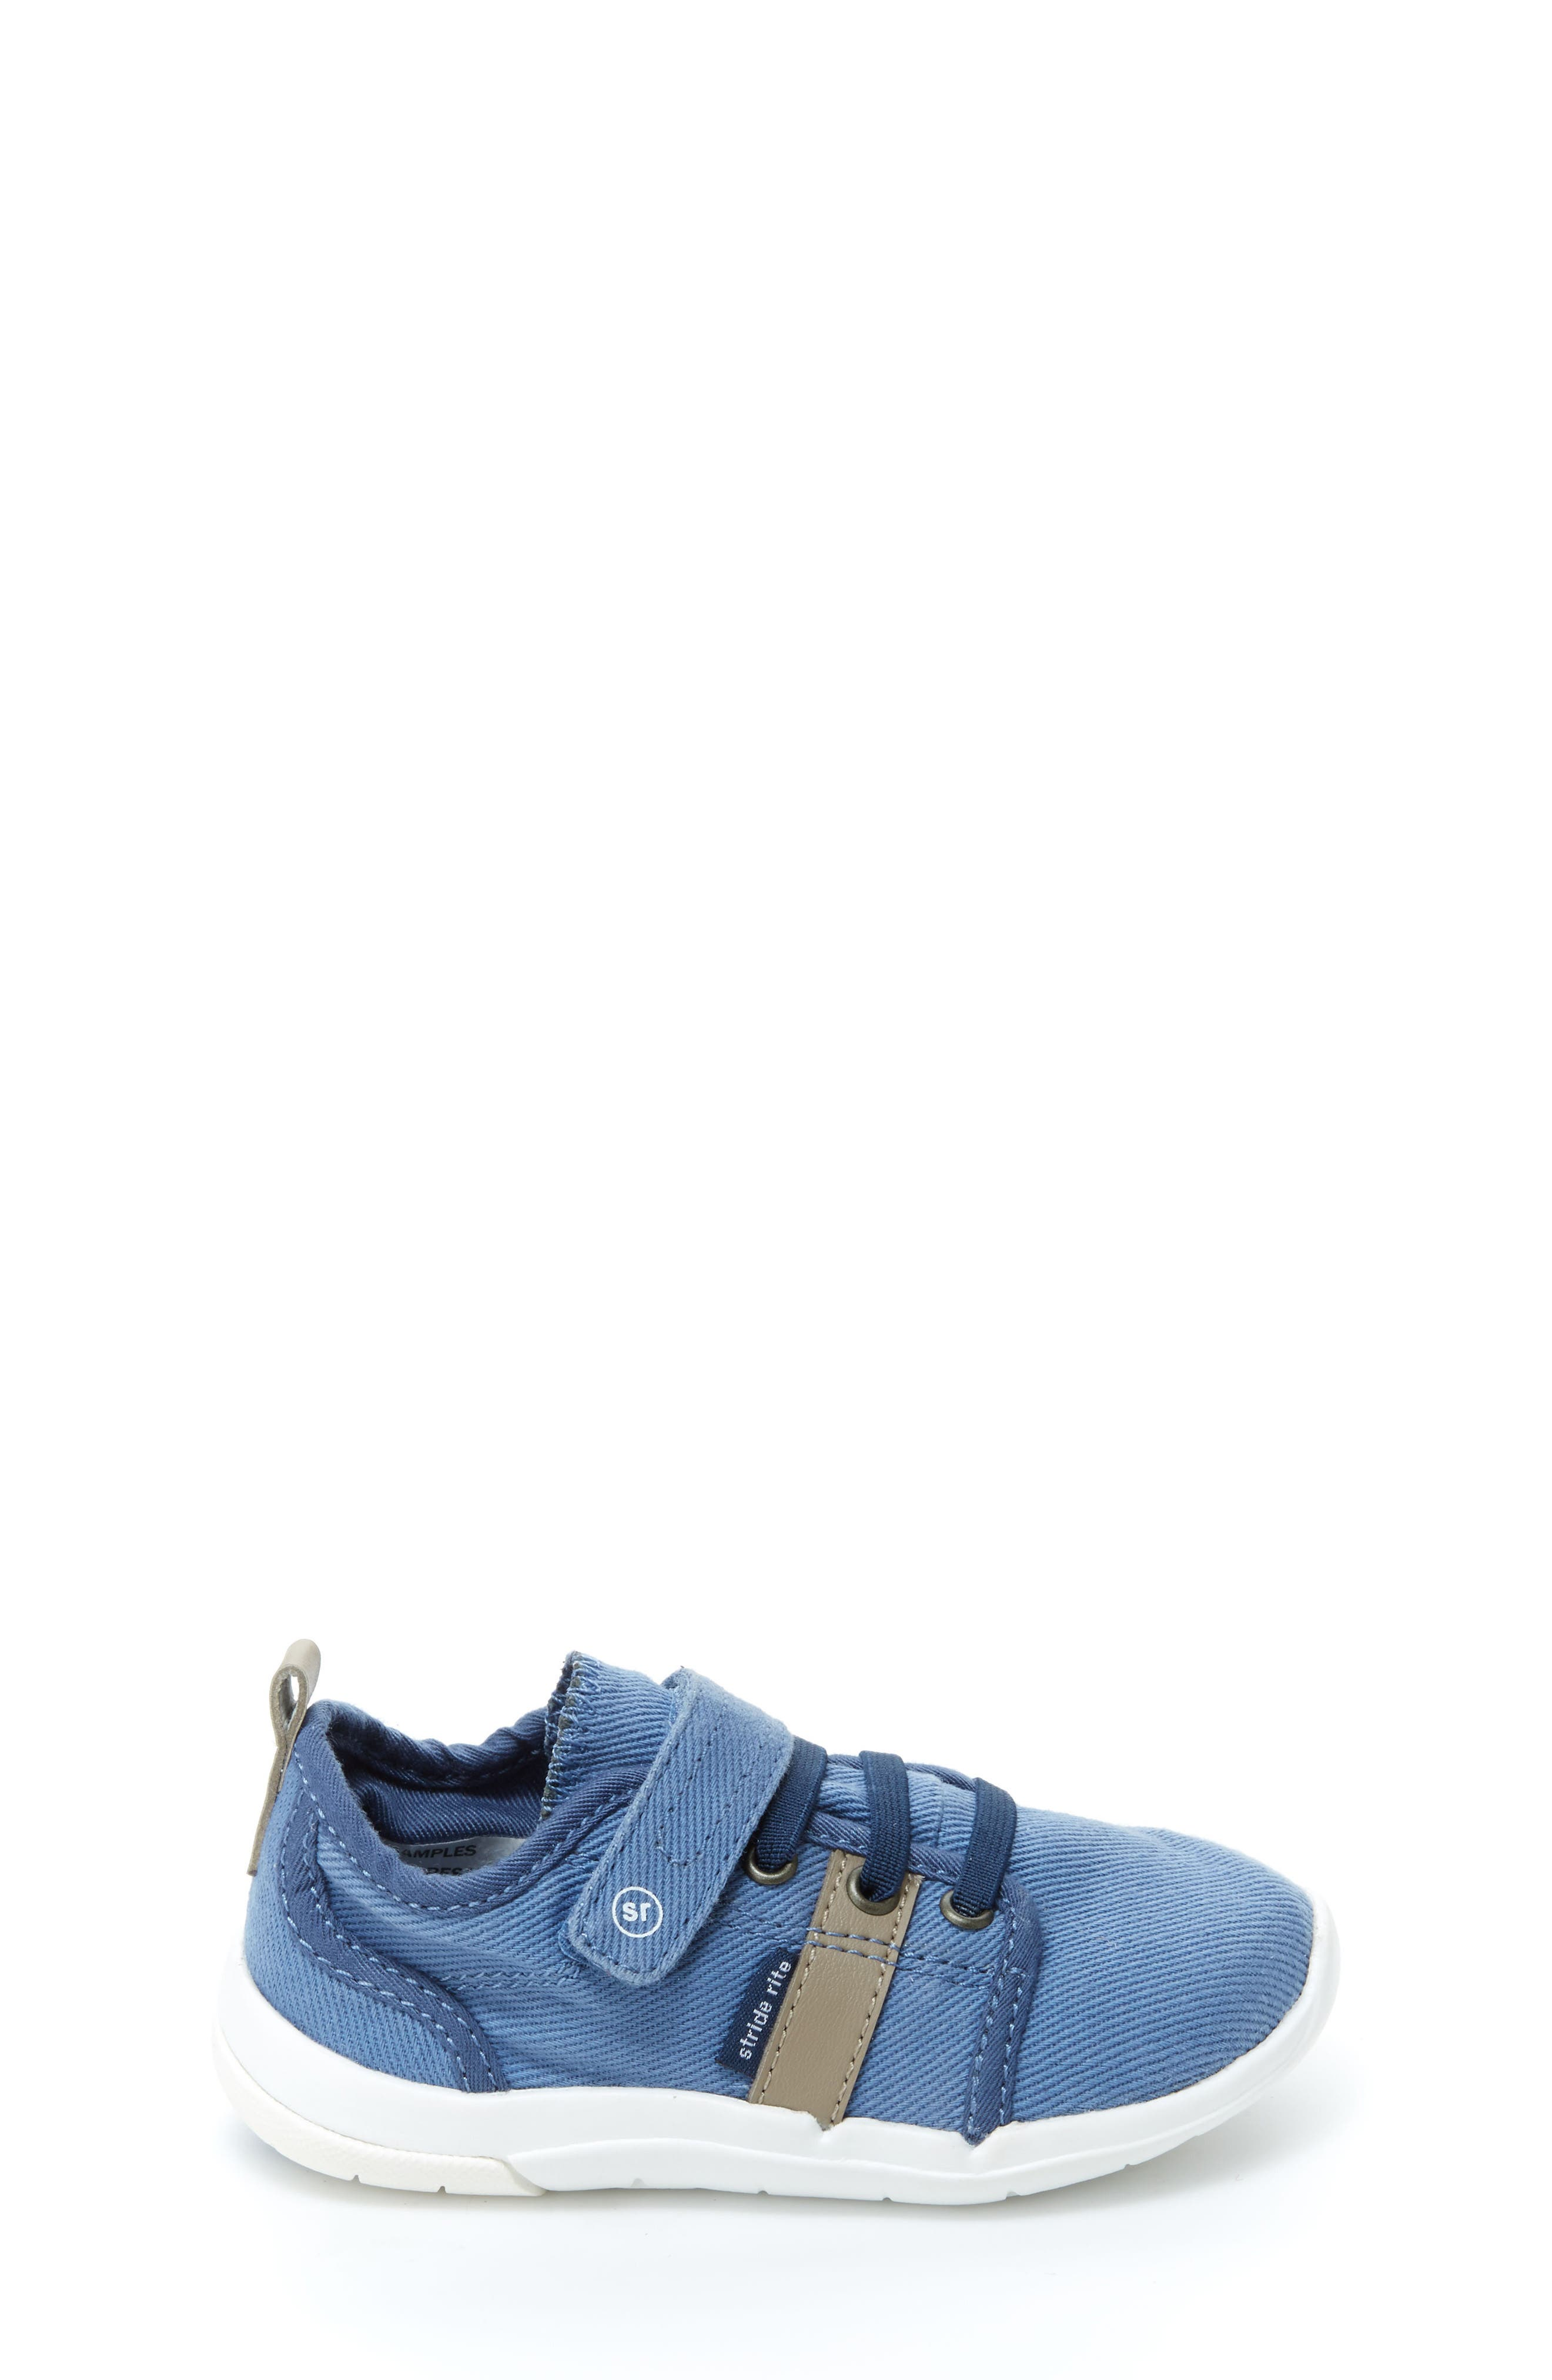 Dixon Sneaker,                             Alternate thumbnail 3, color,                             400